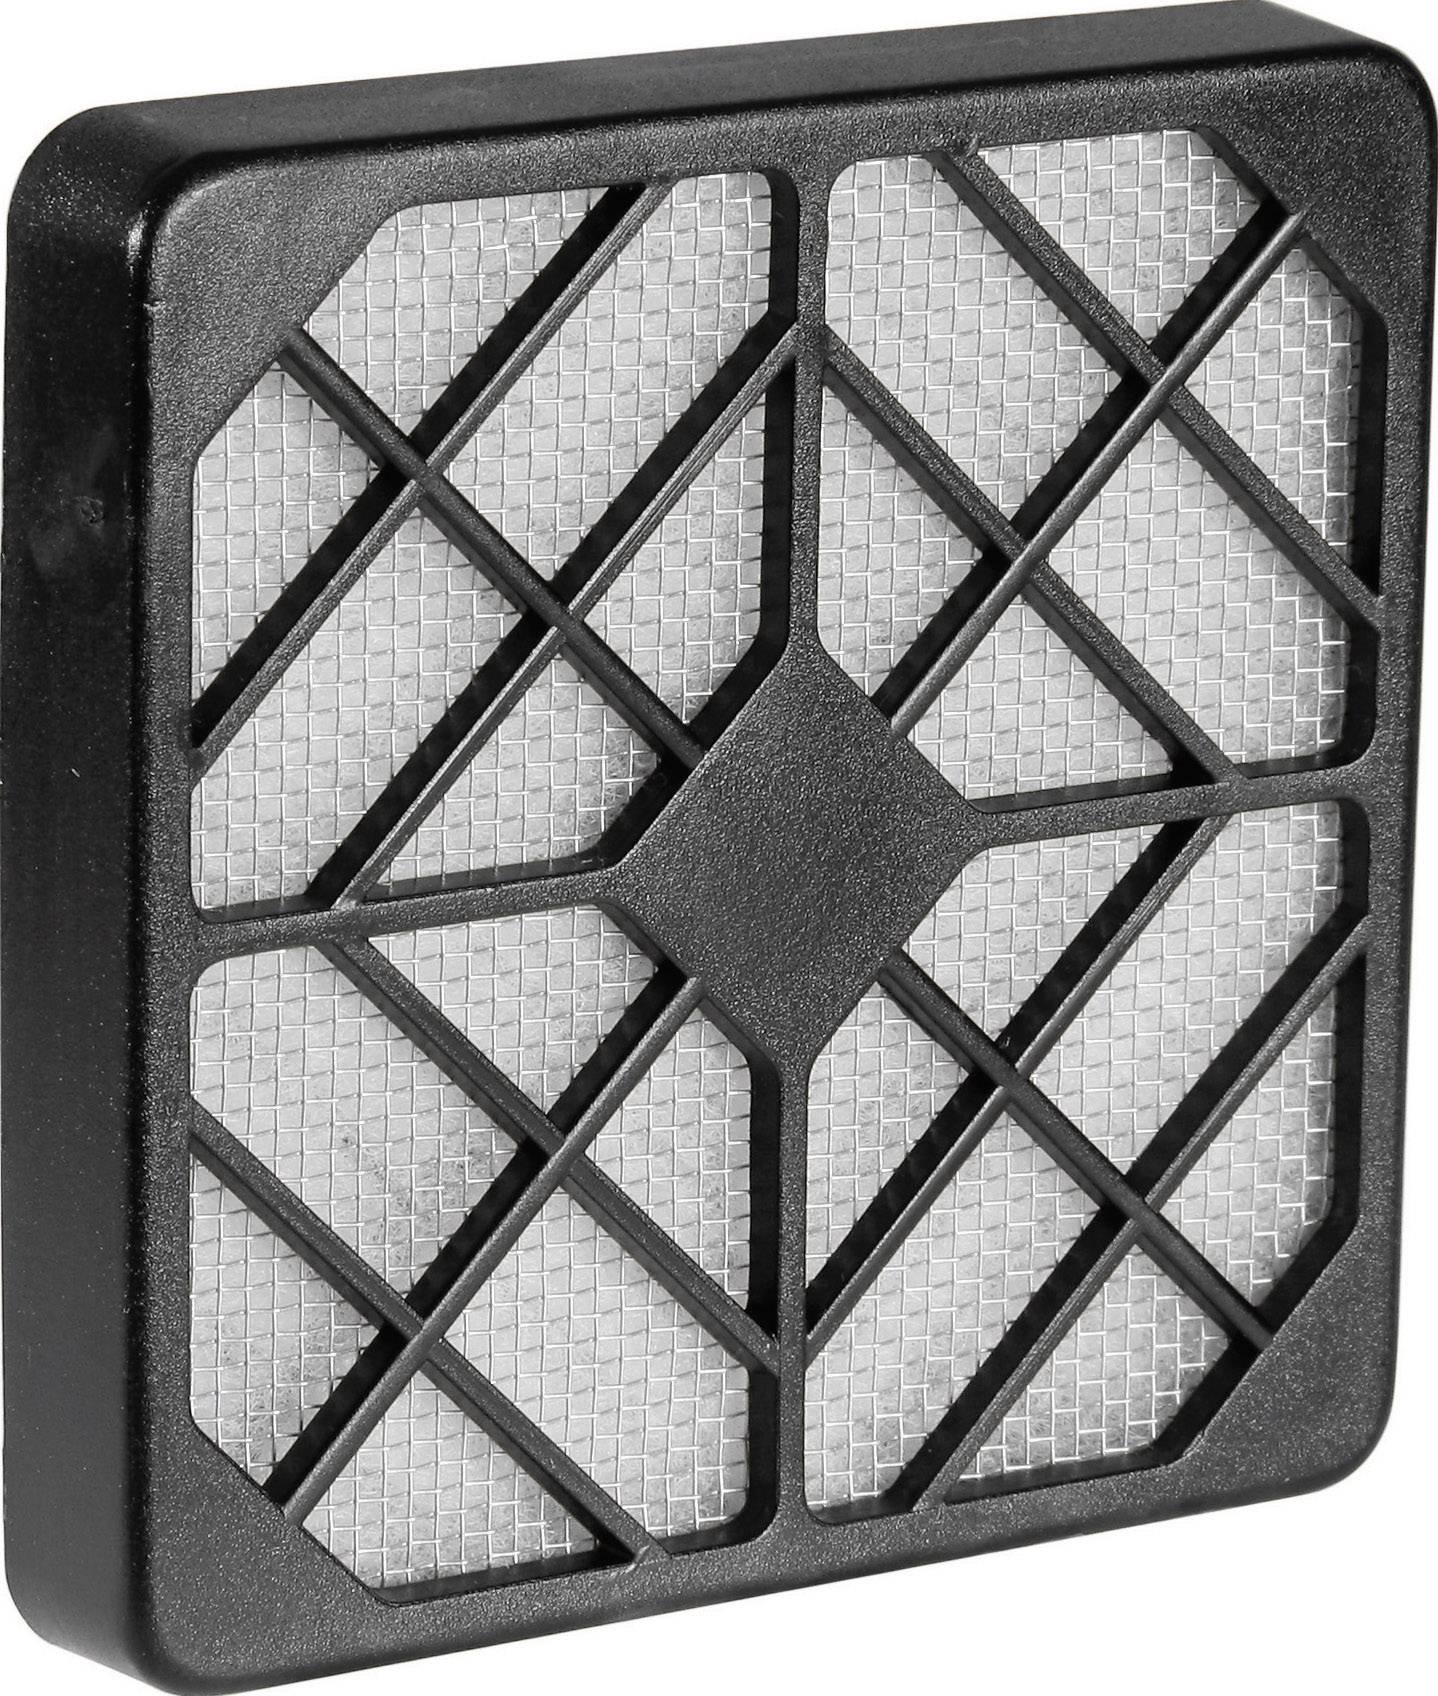 Ochranná mřížka ventilátoru proti prachu SEPA LFG92-45, 97 x 97 x 12.2 mm